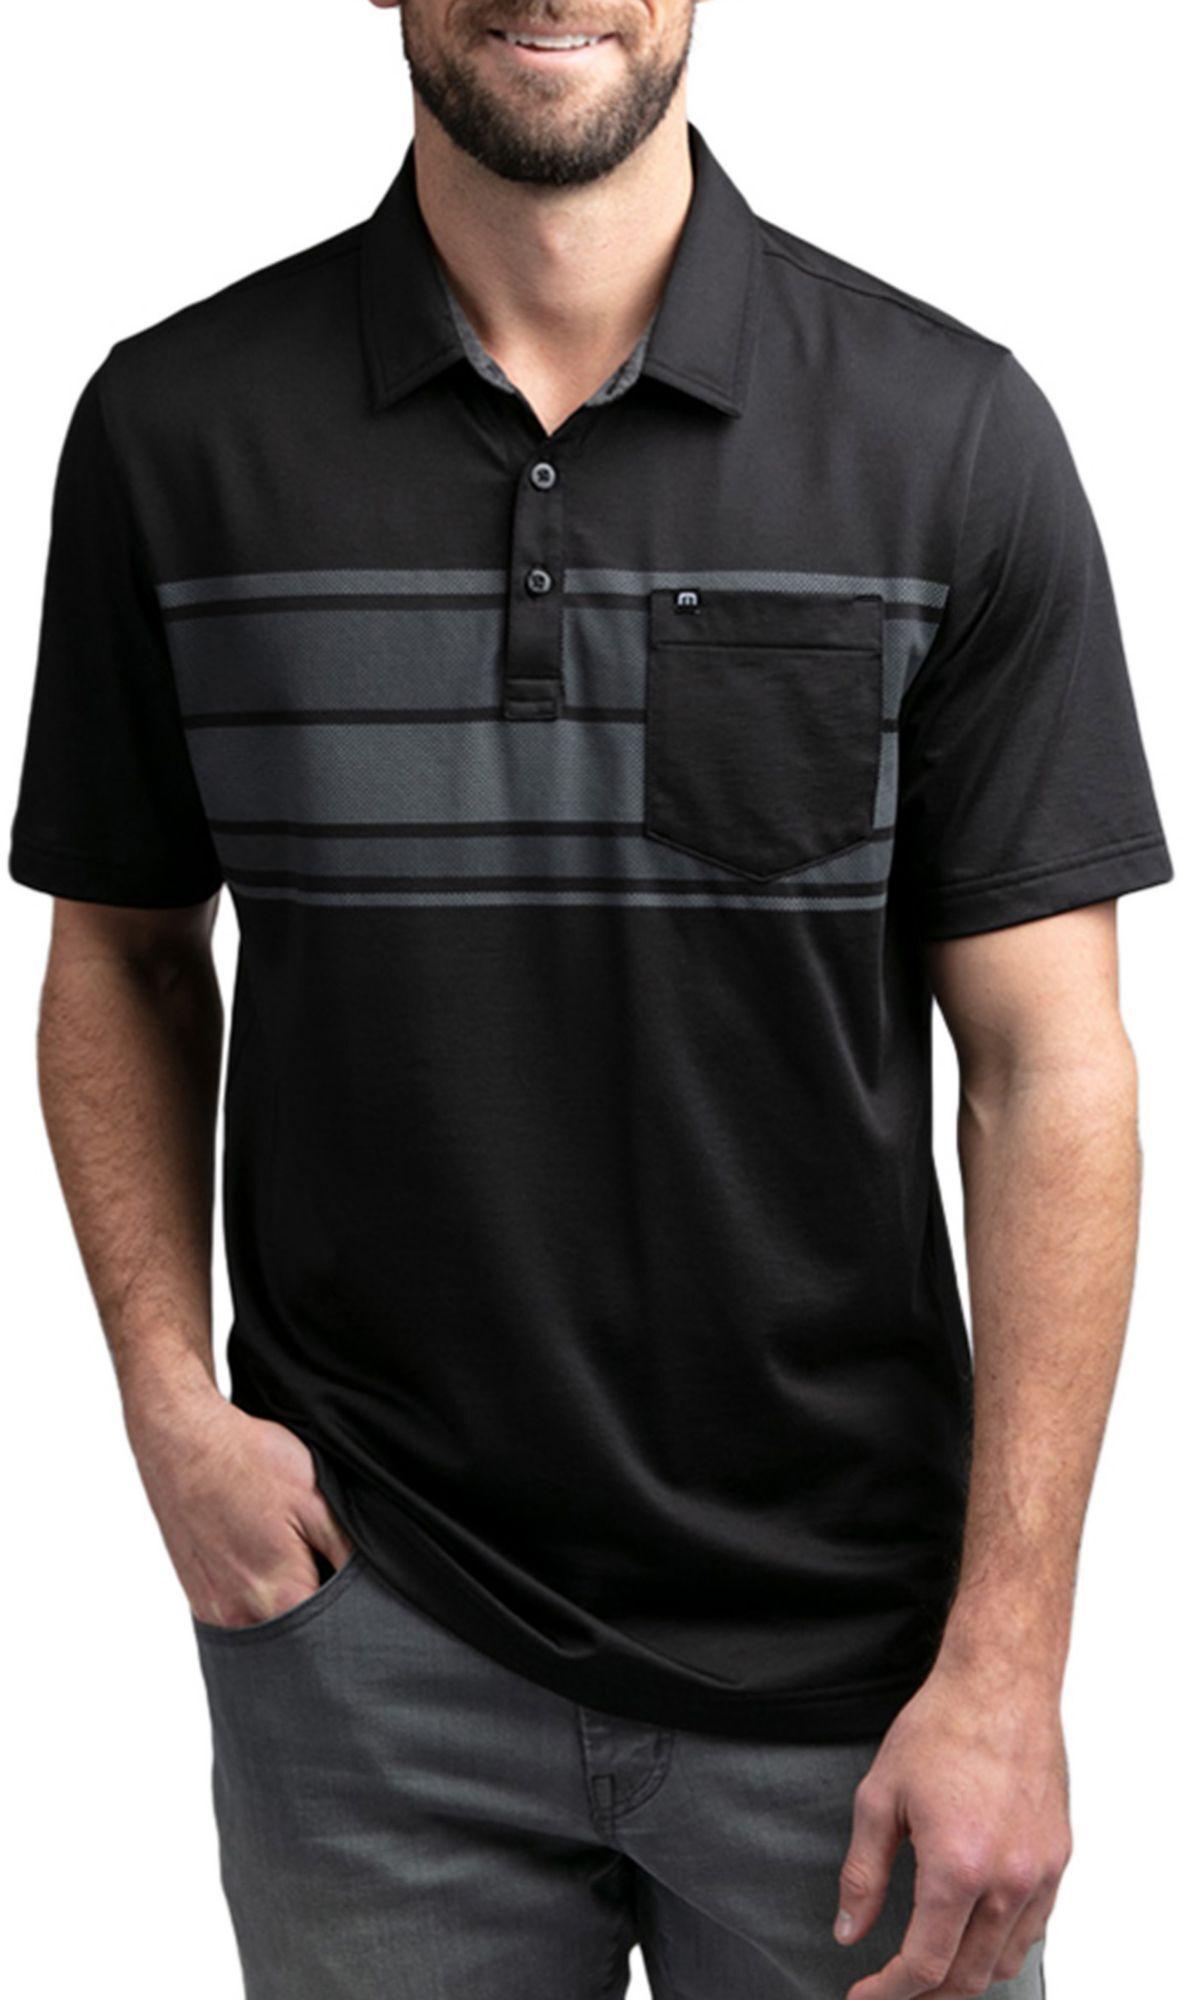 TravisMathew Men's Casual Dining Golf Polo, Medium, Black